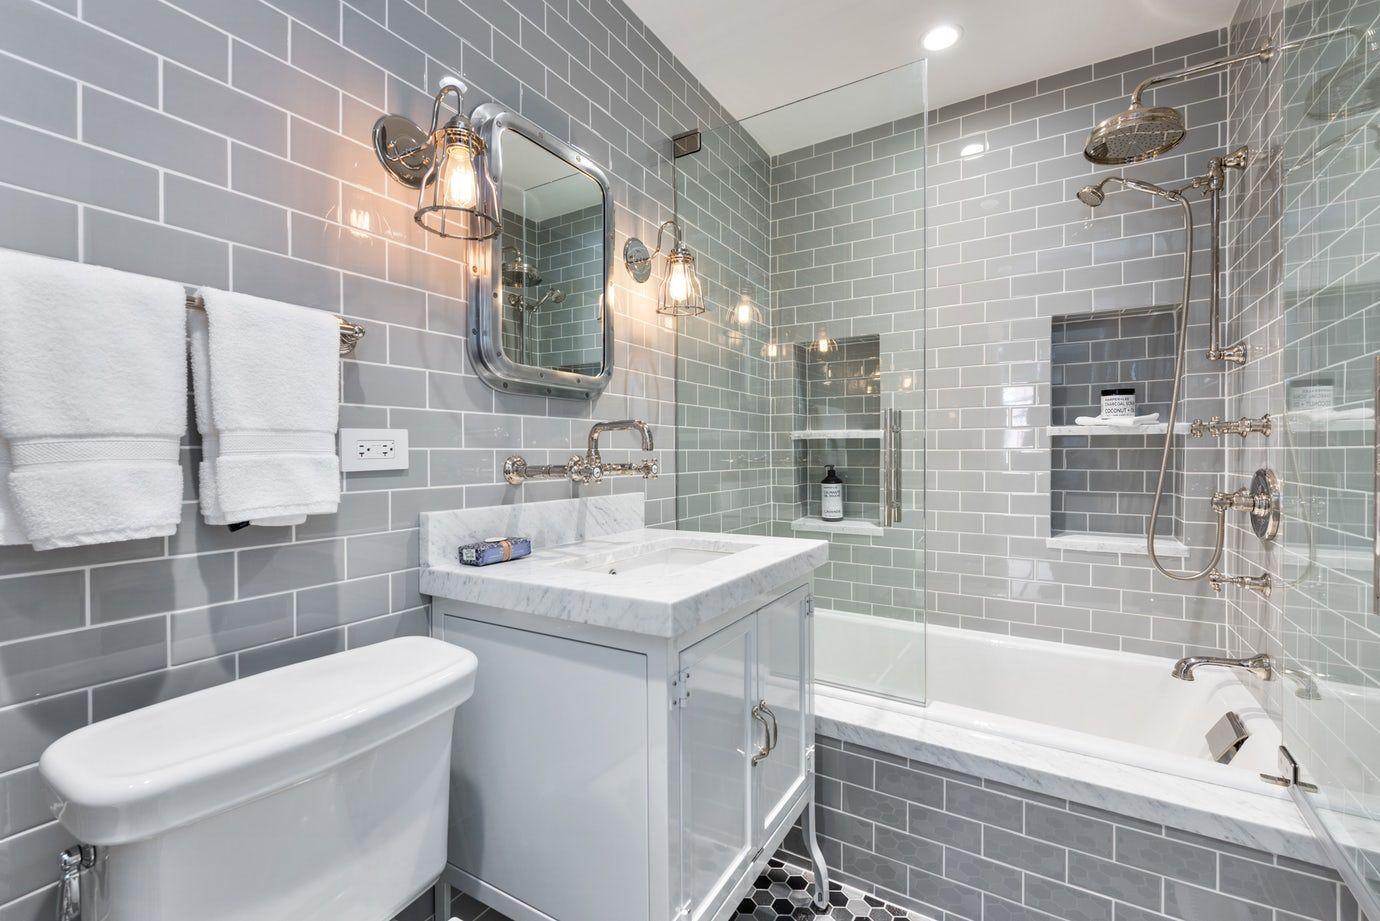 Industrial Condo, Bathroom with light gray subtile tile and wallmounted faucet Bath Industrial by Rae Duncan Interior Design